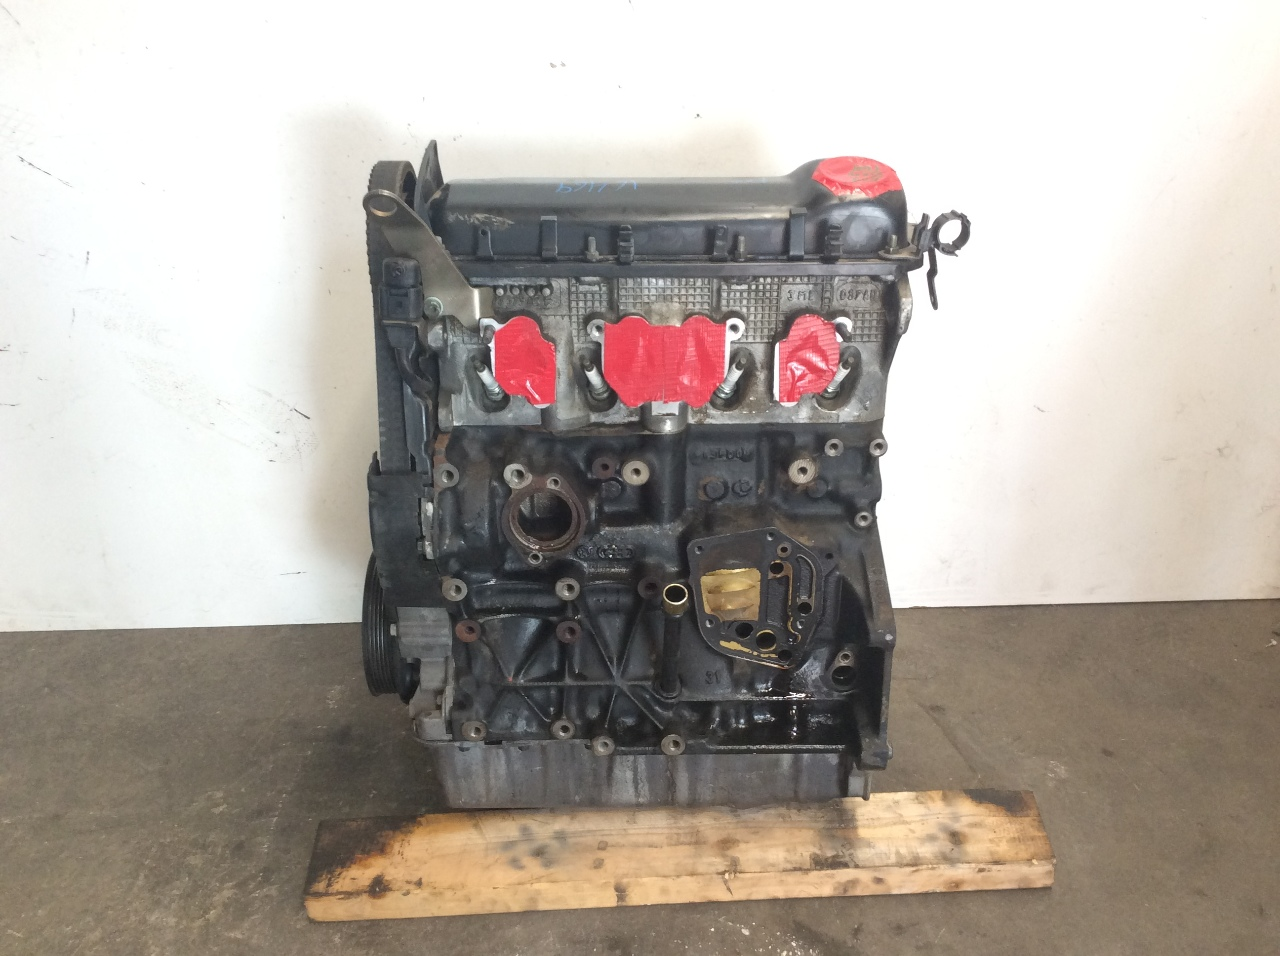 2001 Jetta 2 0l Engine Diagram Real Wiring 2000 0 1999 Volkswagen Beetle Golf Coolant Hose Vw Cooling System